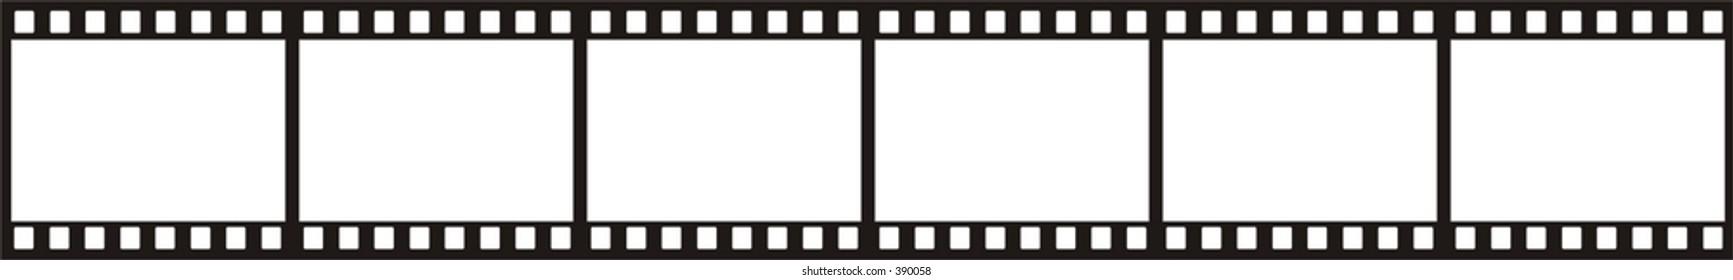 Film strip 1:1 in vector (24x36mm)